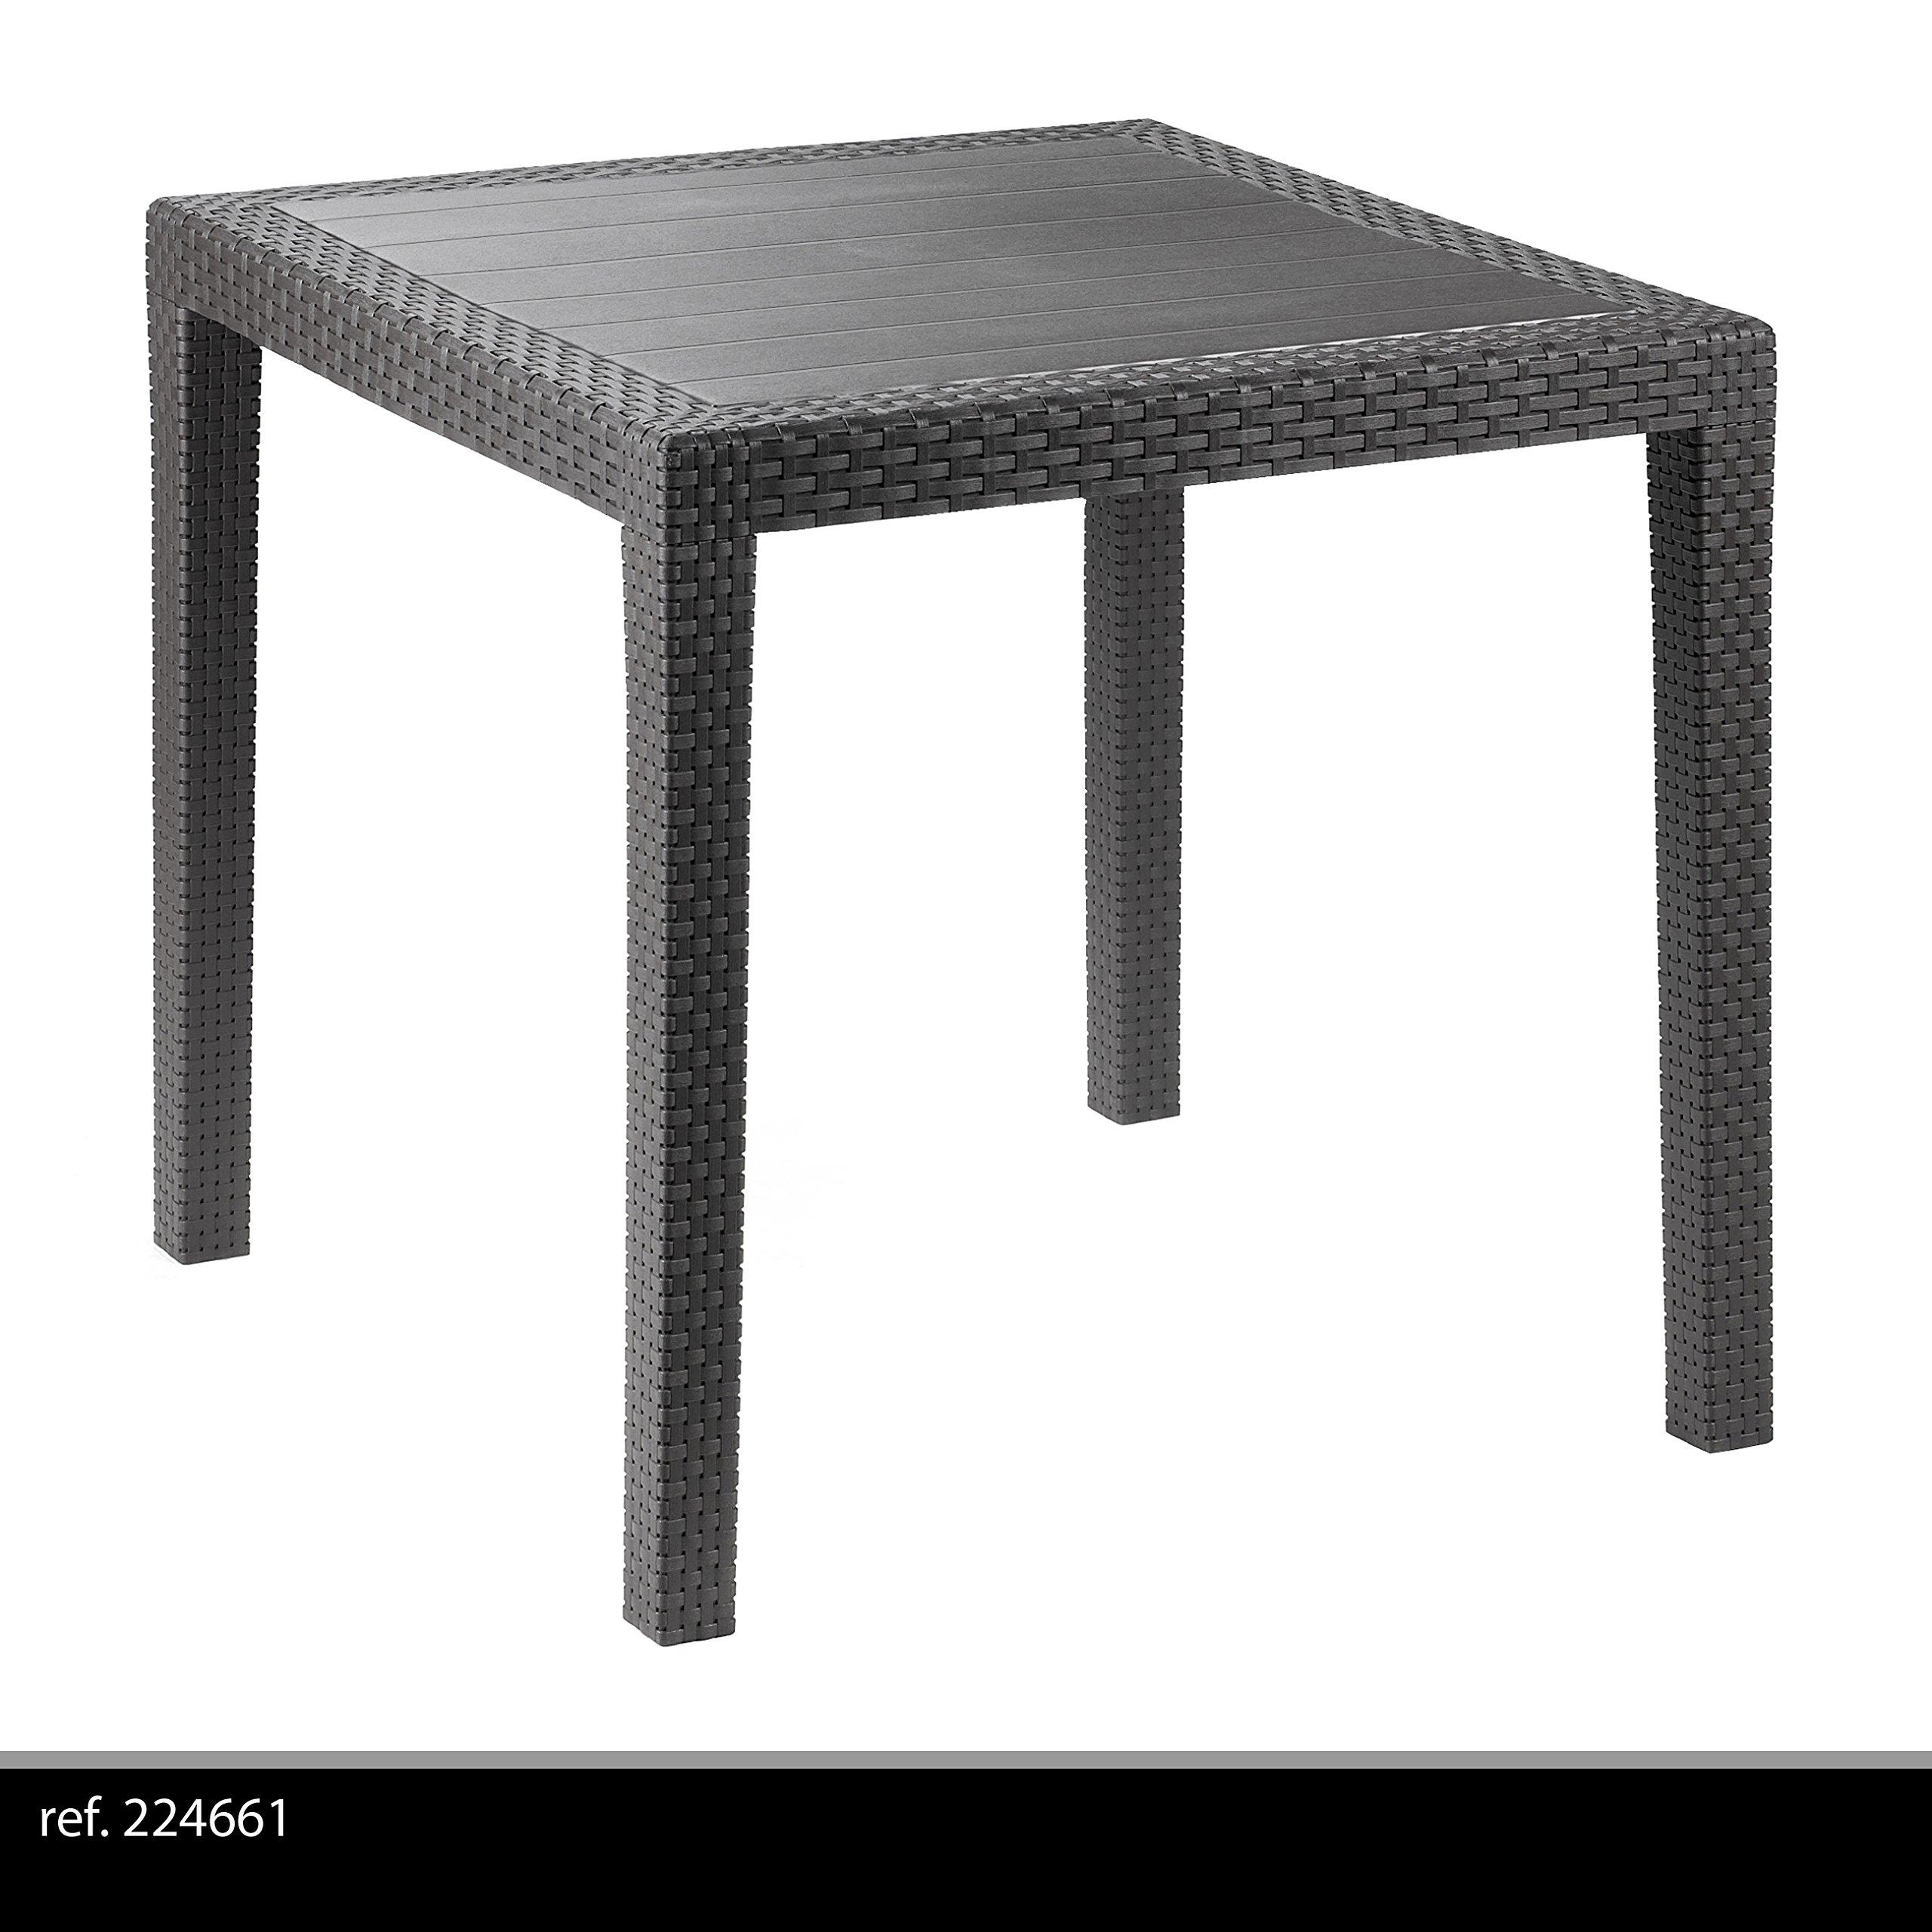 plastic patio table amazon co uk rh amazon co uk cheap resin patio furniture cheap plastic outdoor tables